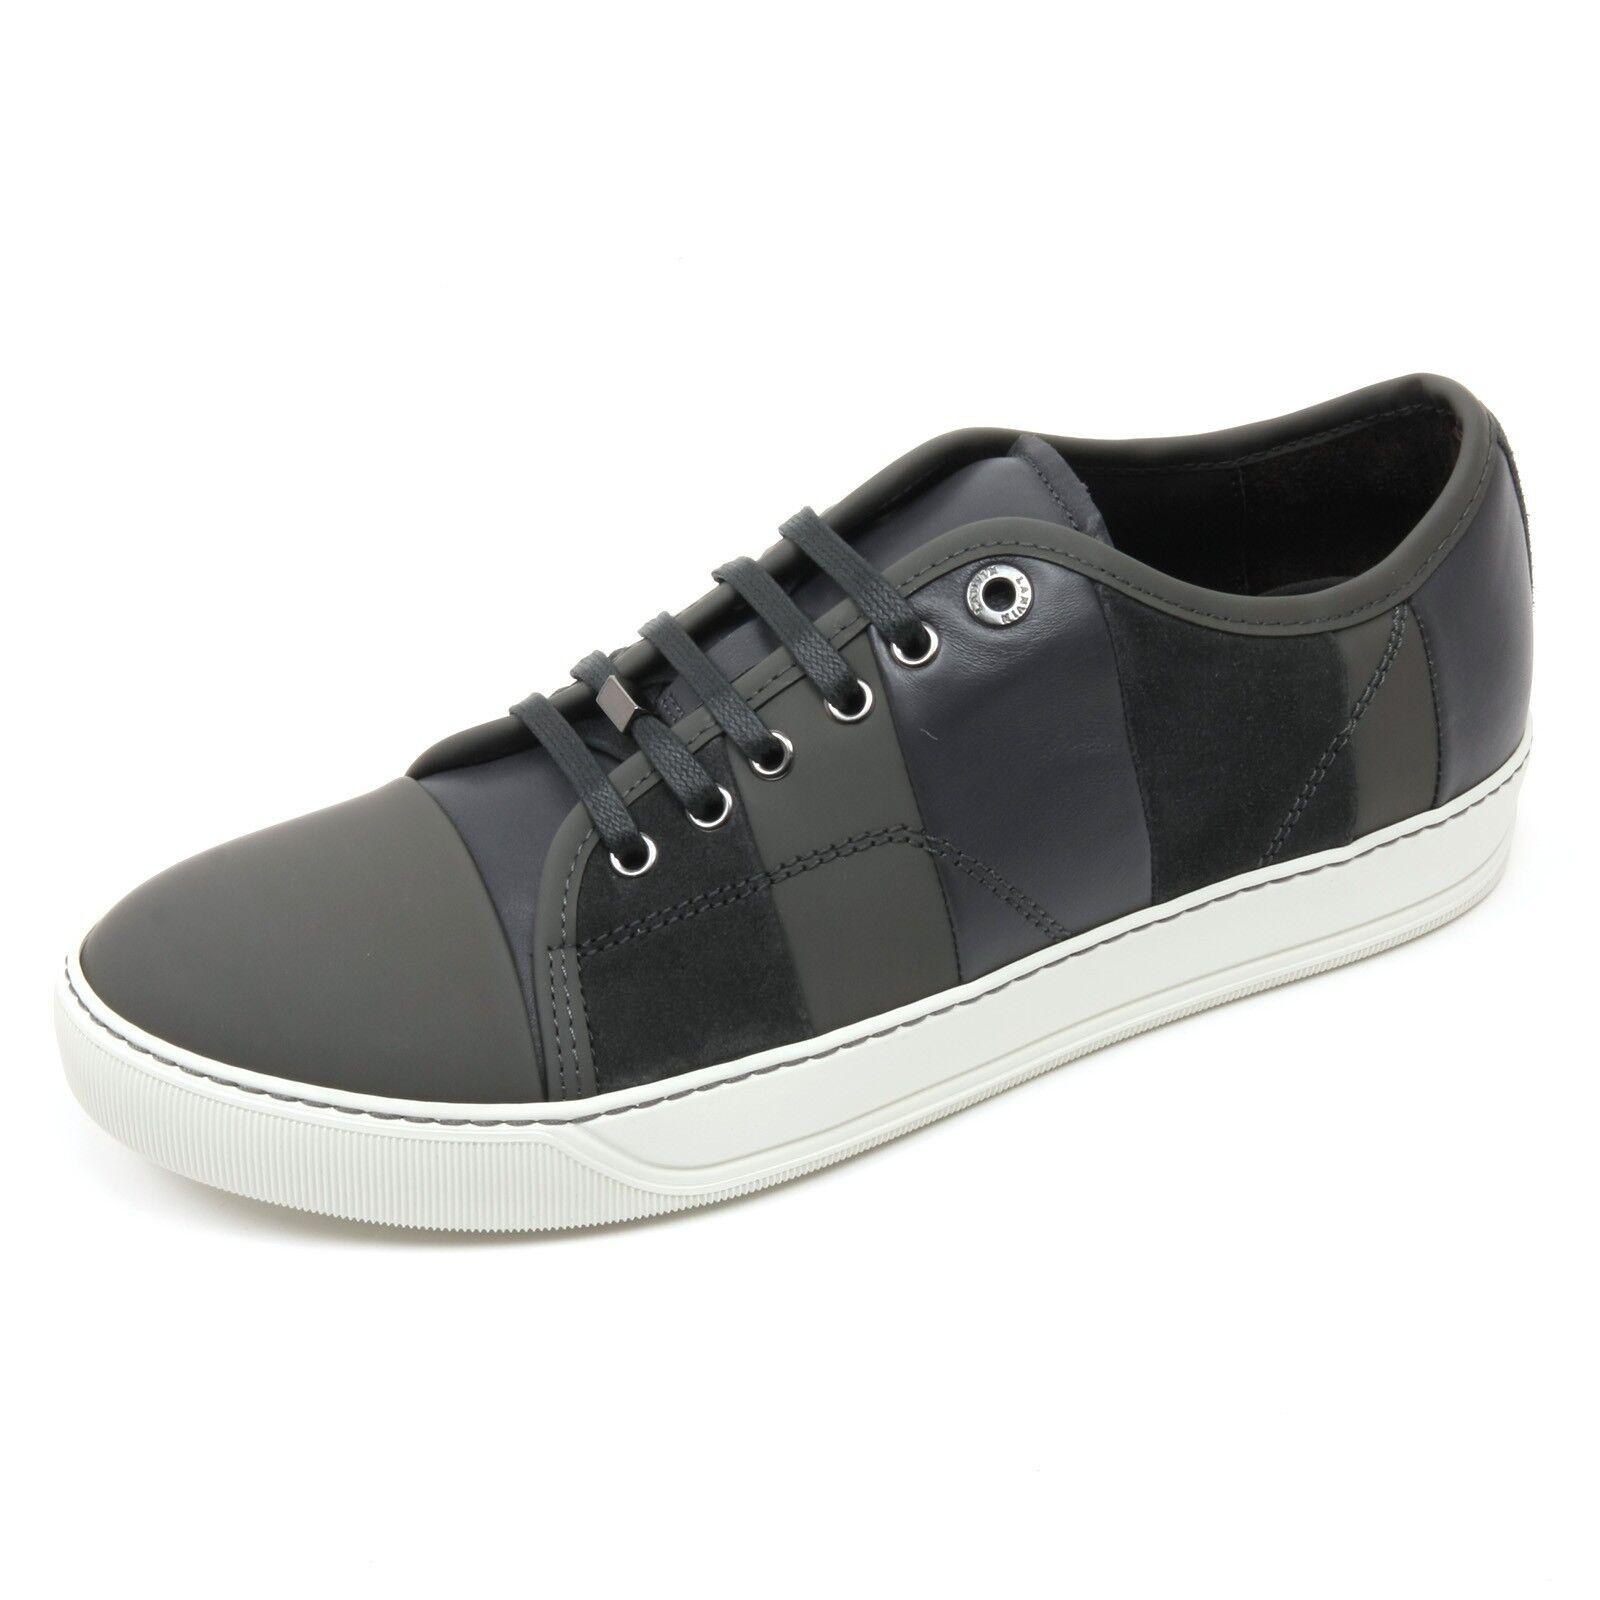 C2874 sneaker uomo LANVIN VEGO scarpa grigio scuro multi stripes shoe man